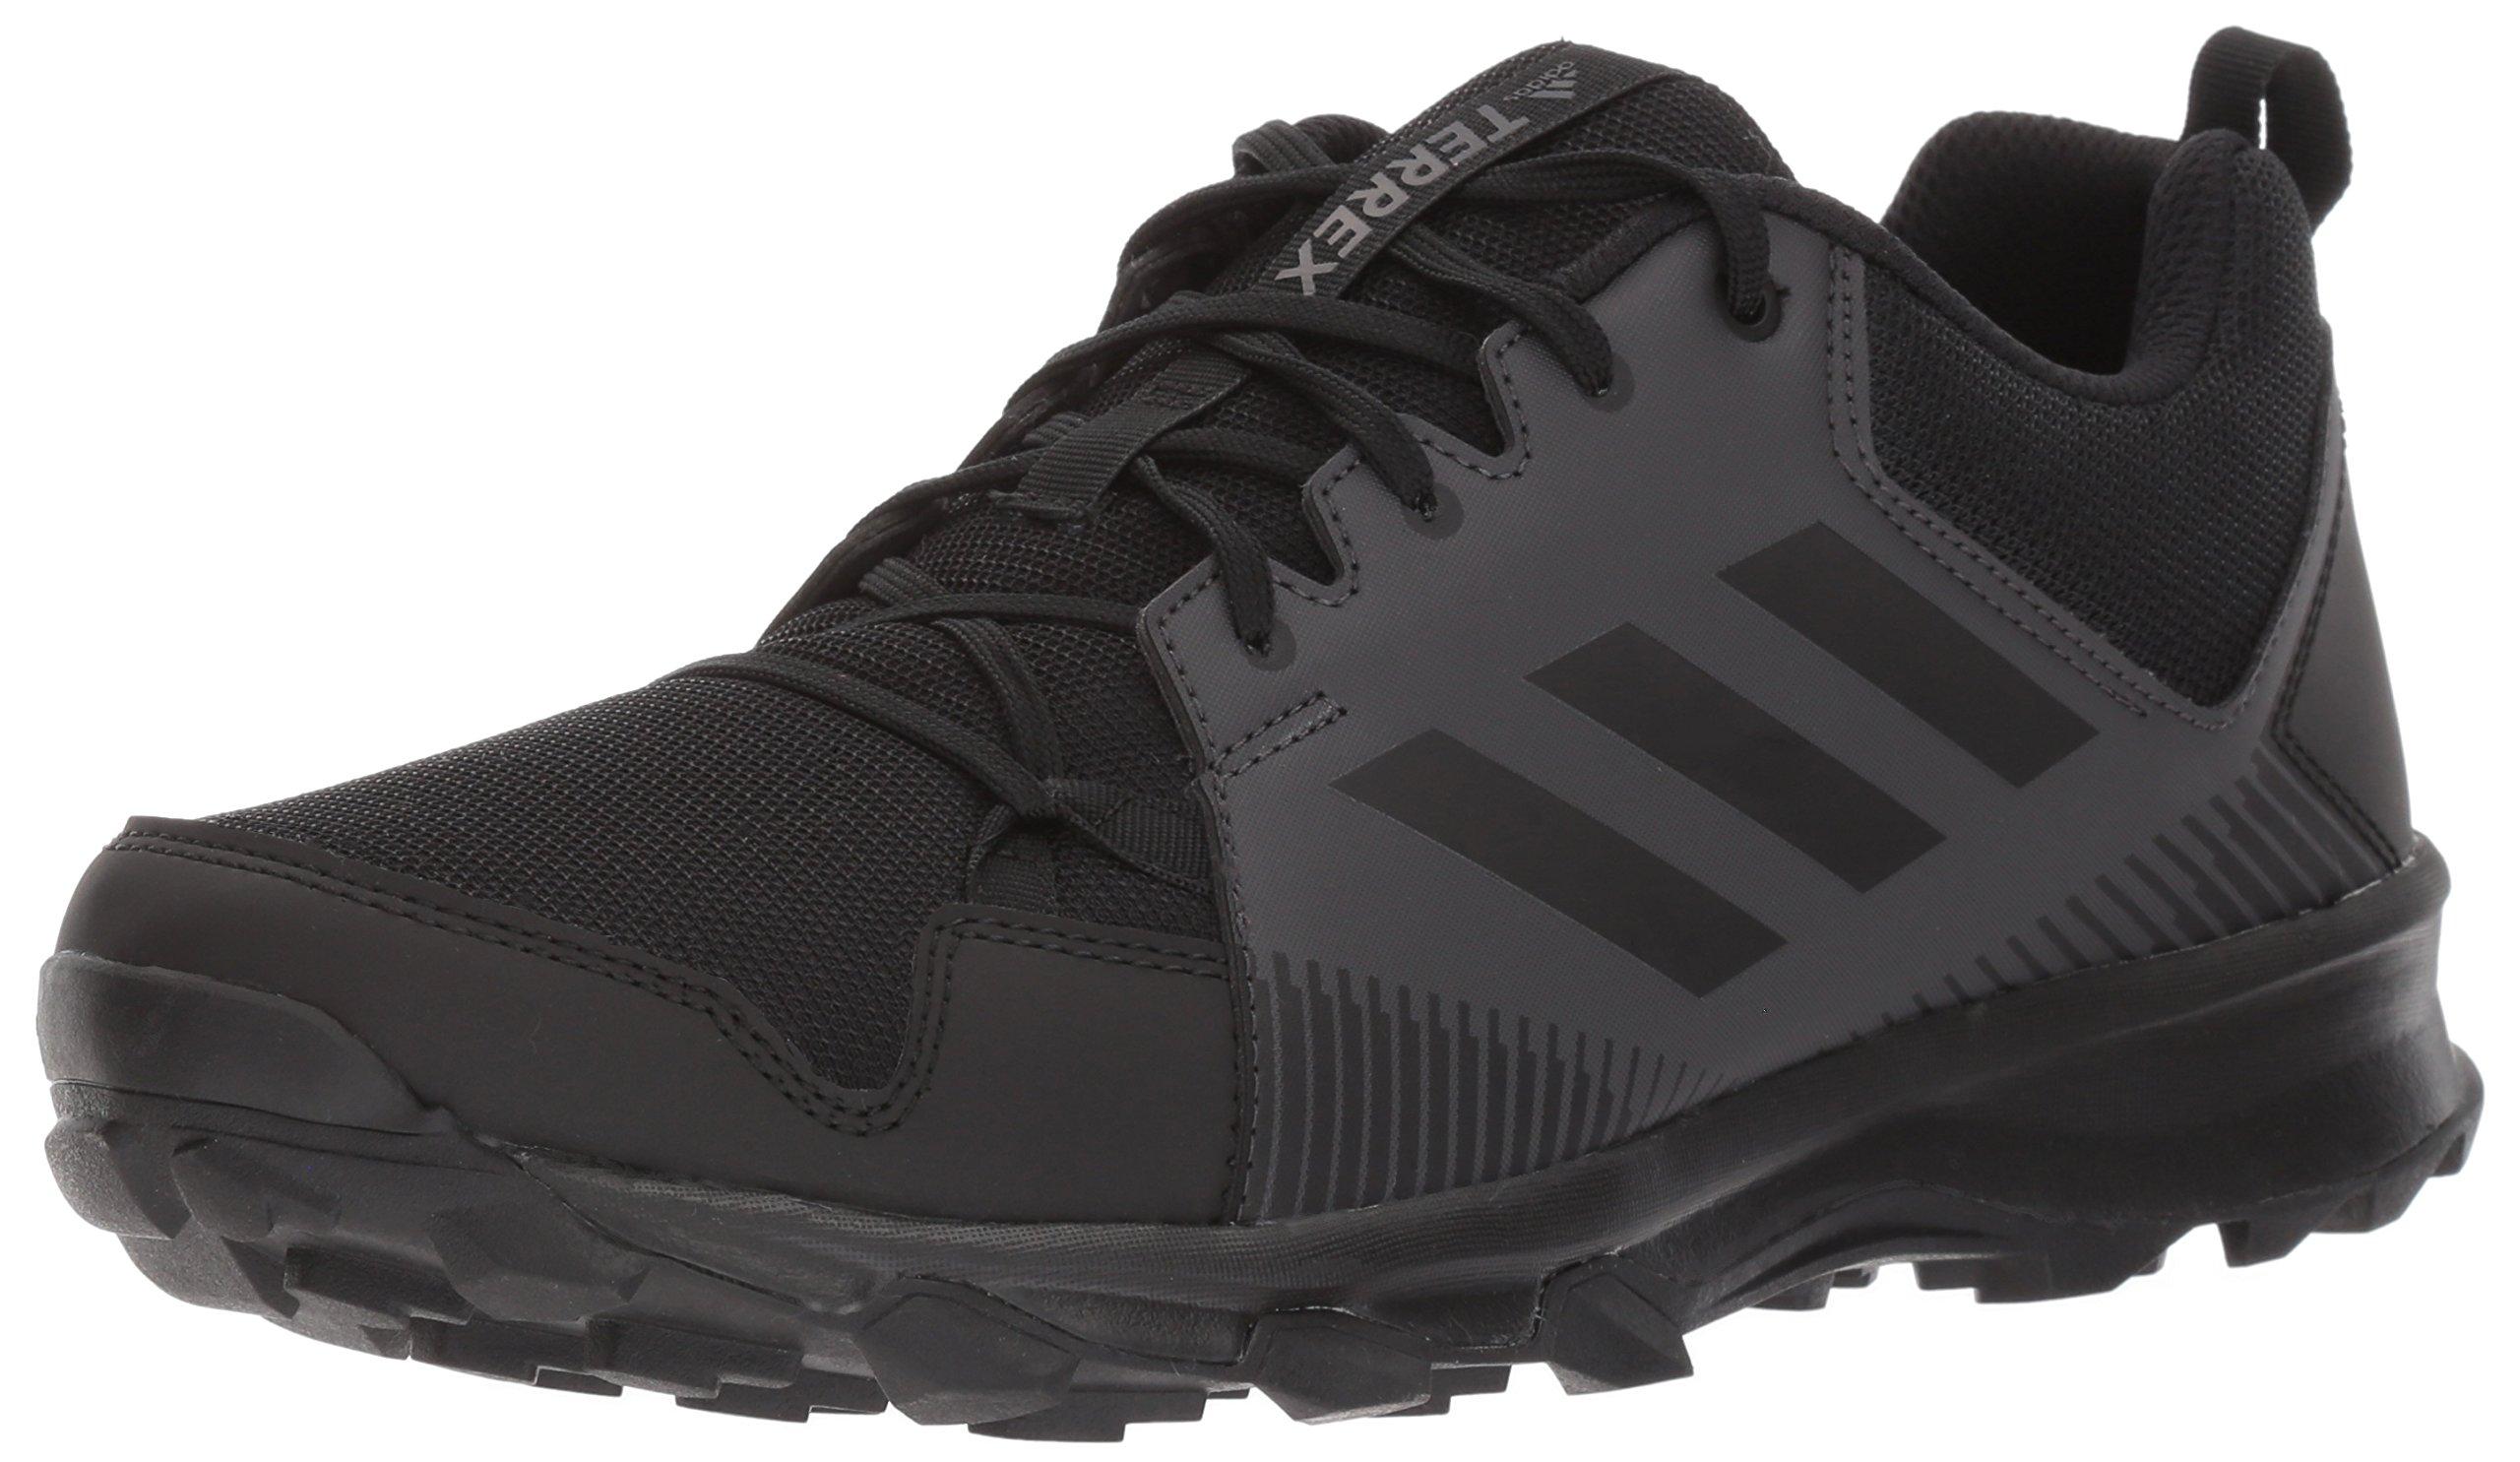 adidas Men's Terrex Tracerocker Trail Running Shoe, Utility Black, 10.5 D US by adidas